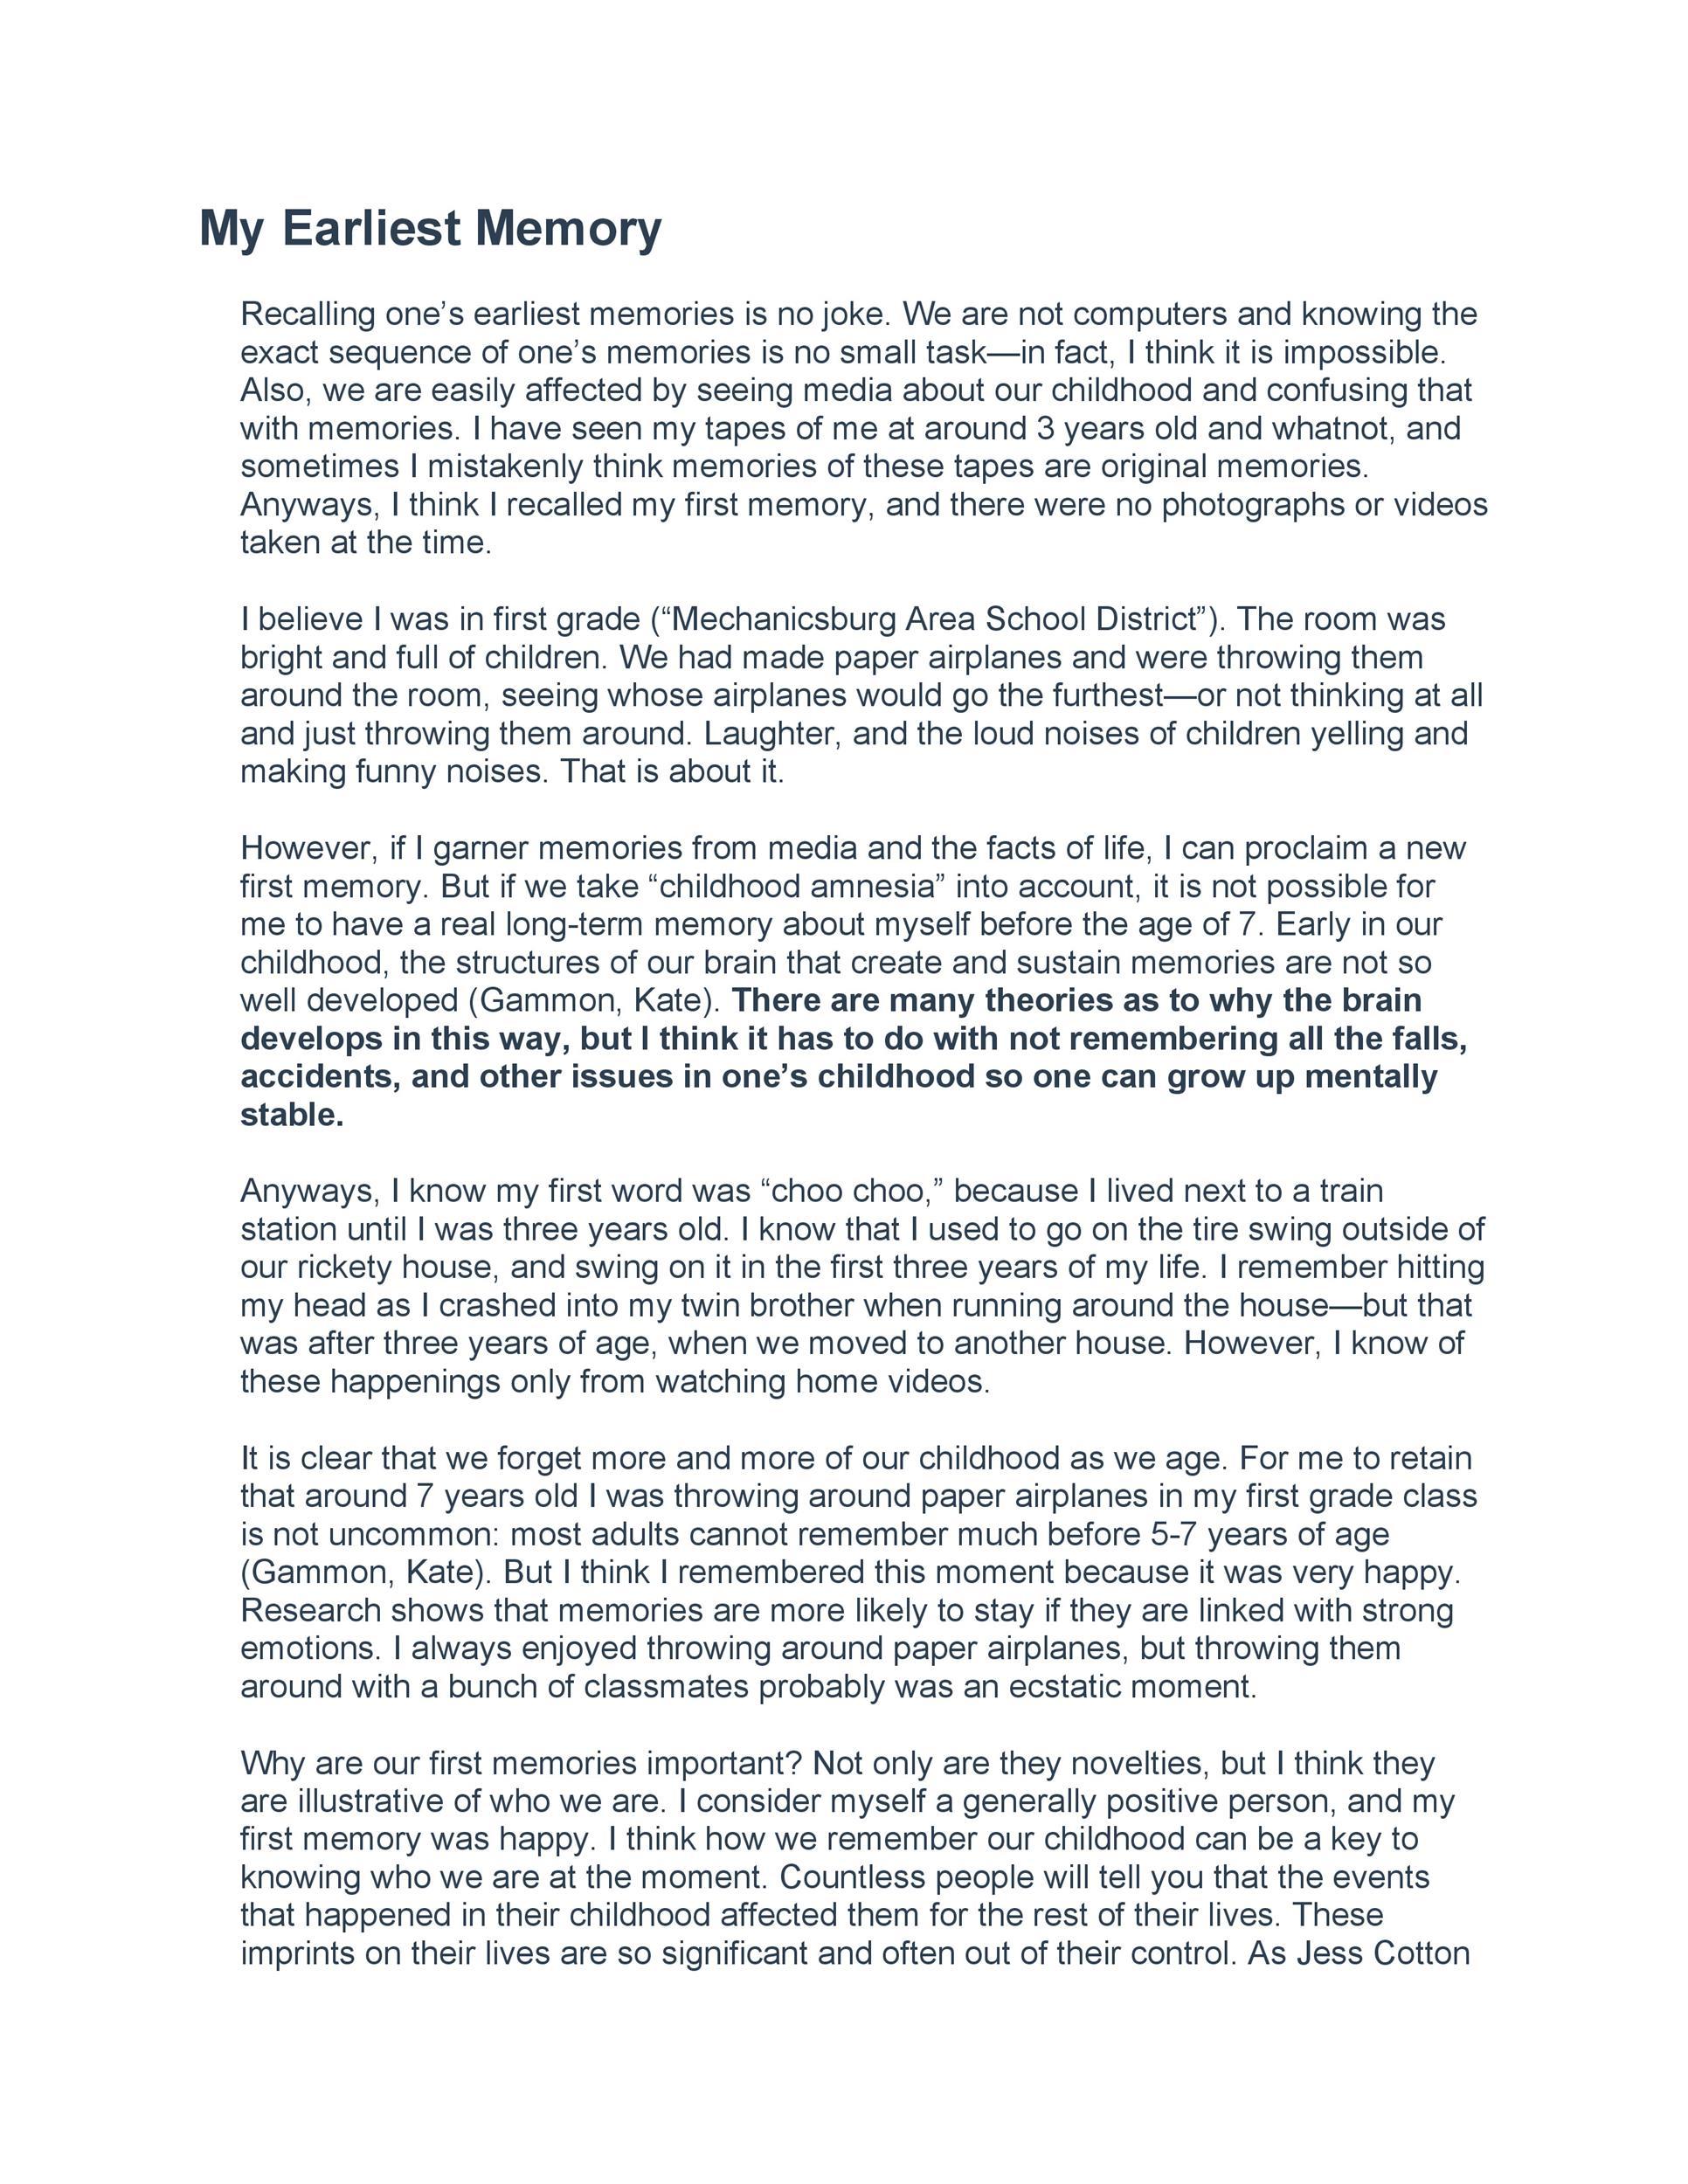 Free reflective essay example 43